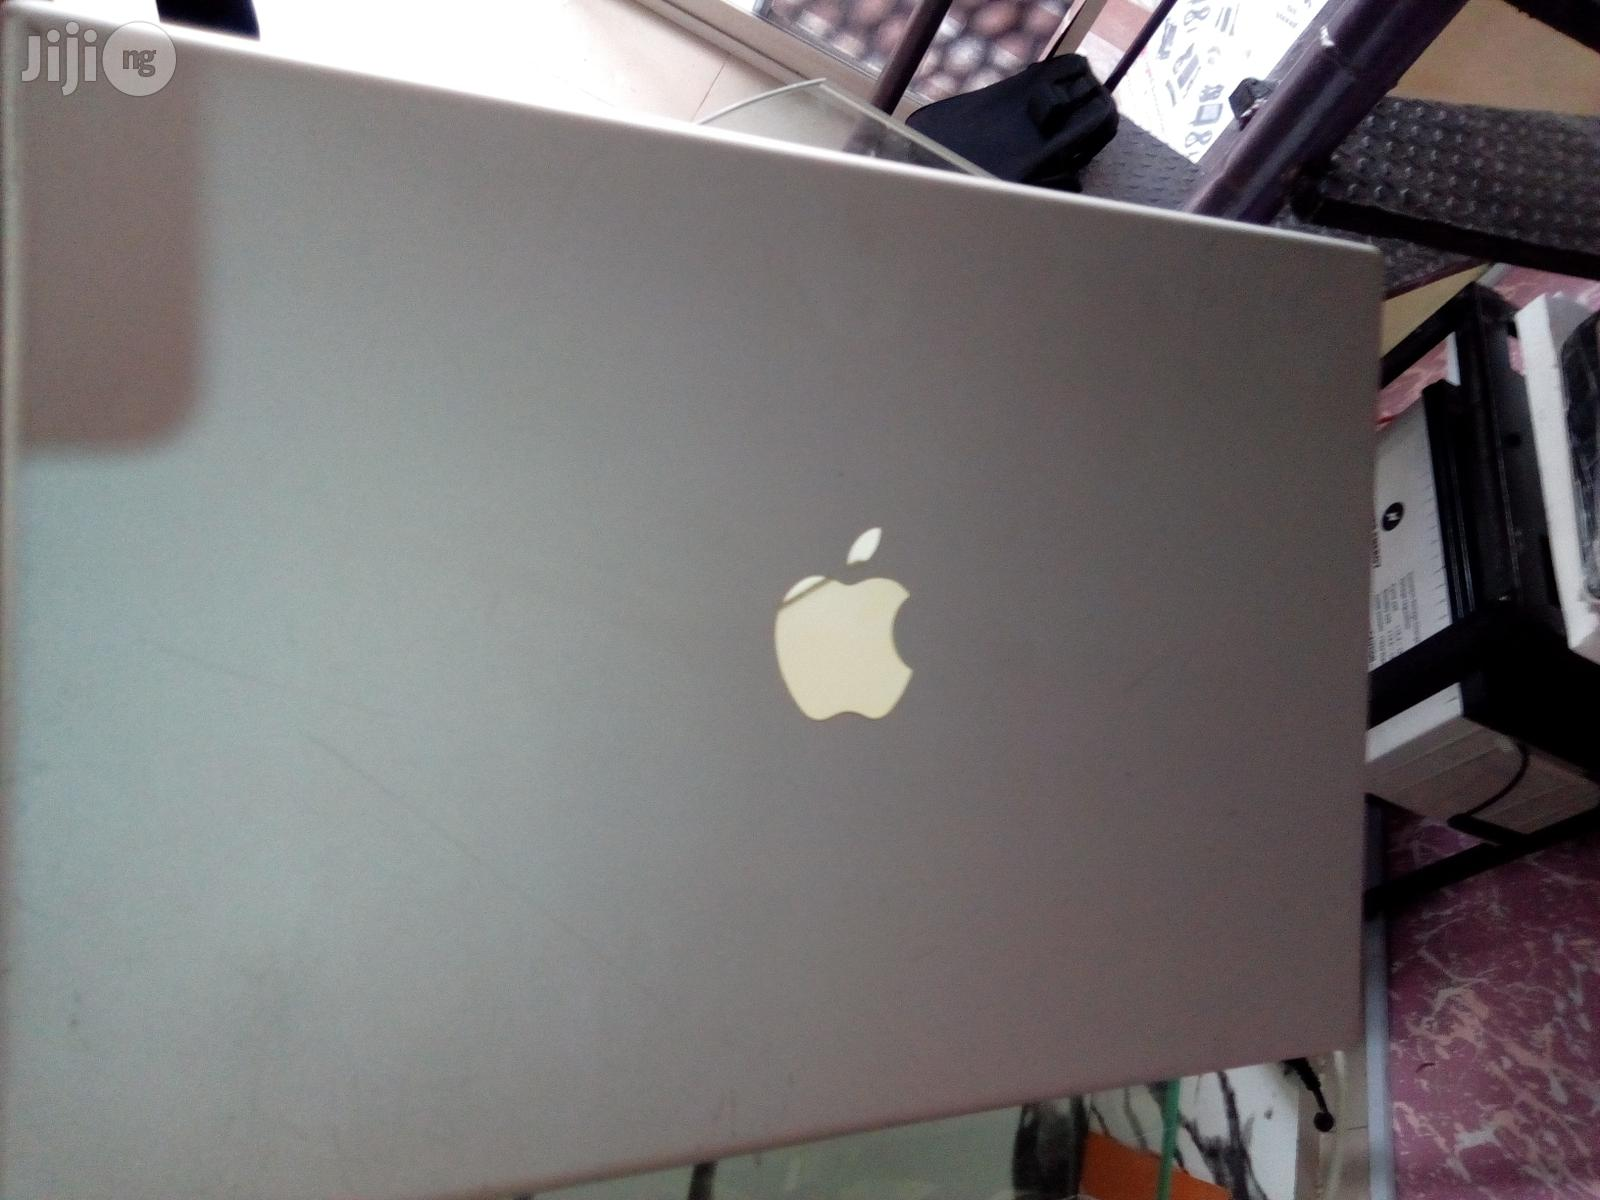 Apple Macbook Pro 15.6inchs 250GB HDD 2GB RAM | Laptops & Computers for sale in Oshodi, Lagos State, Nigeria